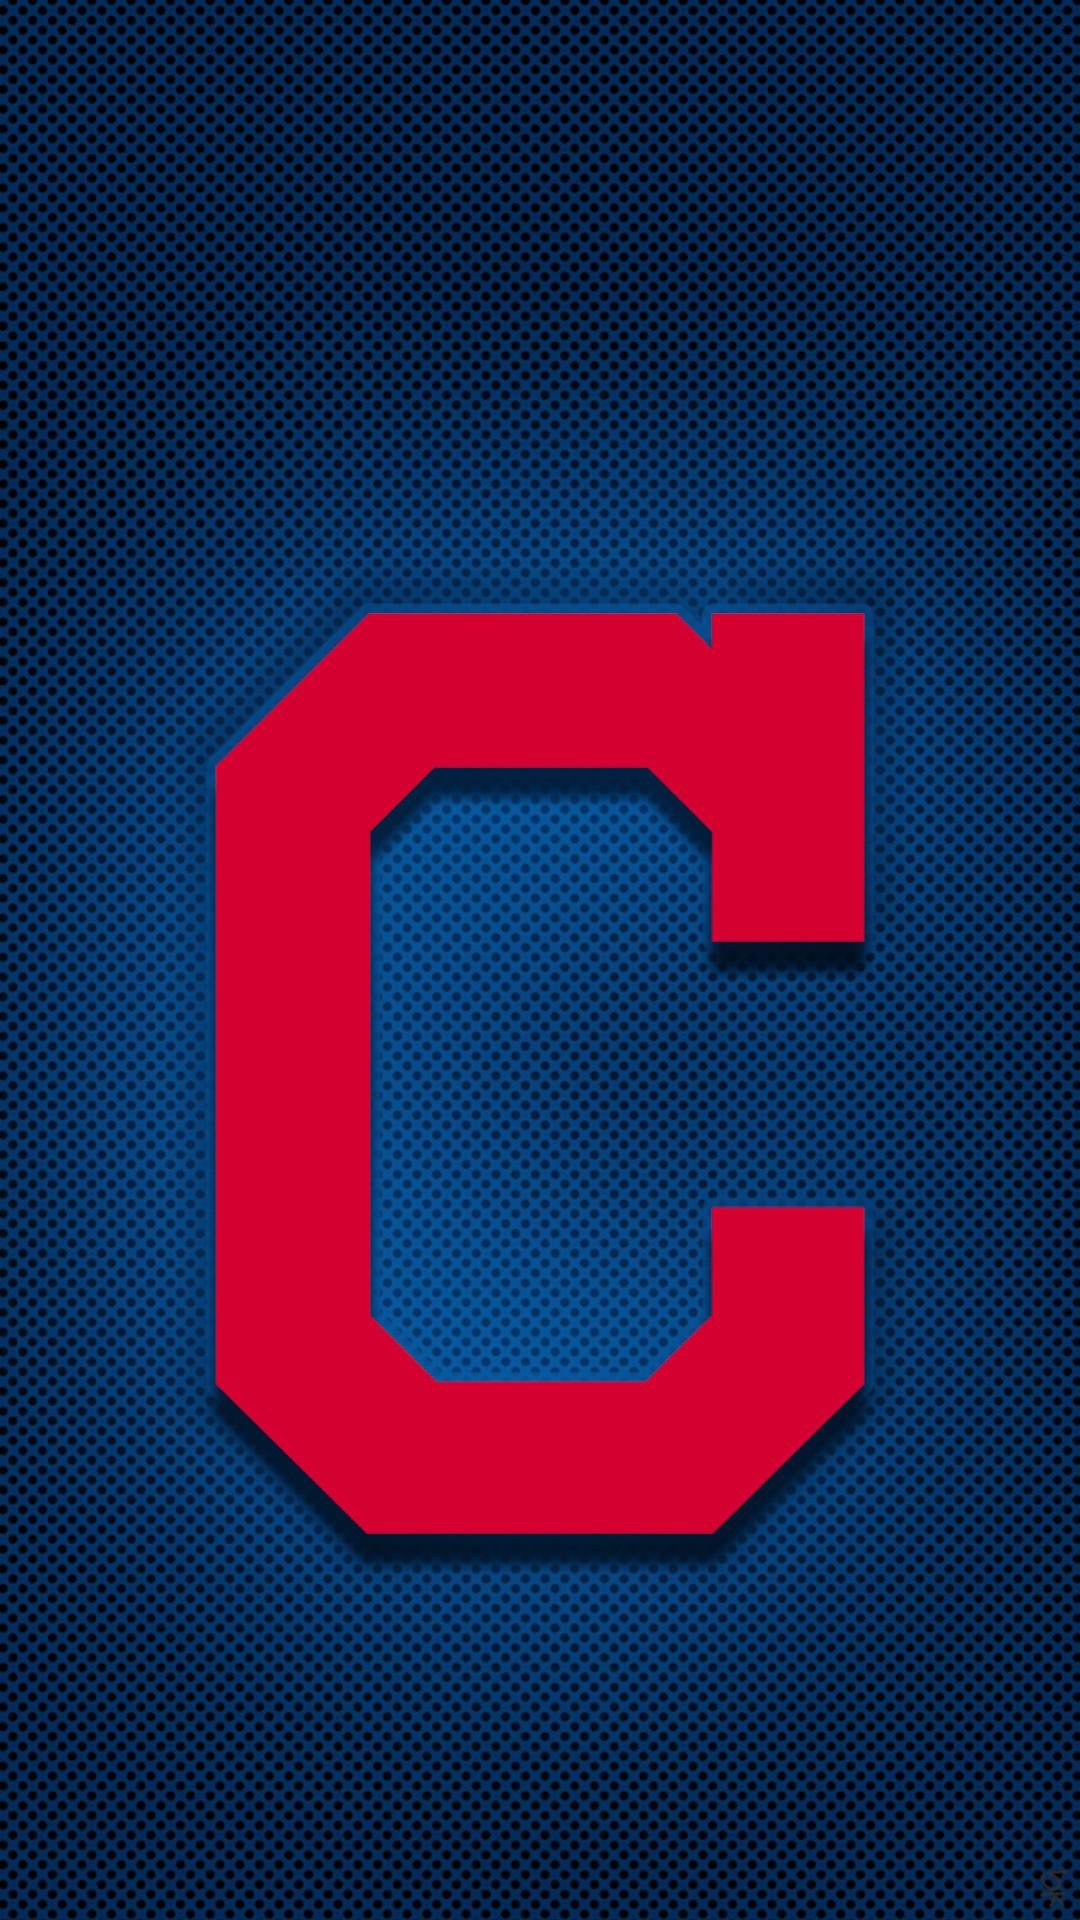 Braves Wallpaper Iphone Cleveland Indians Wallpaper Screensaver 58 Images